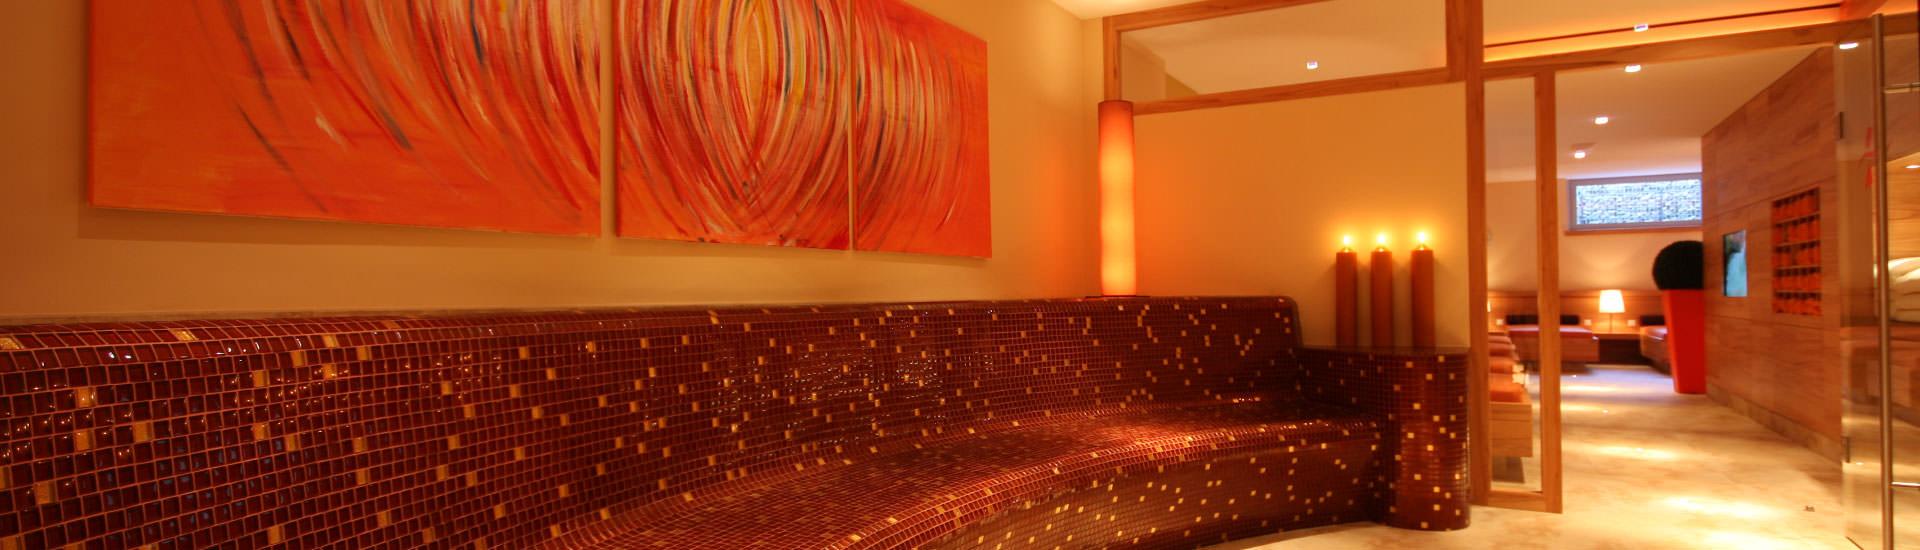 Hotel Impuls Tirol  SPA Welt